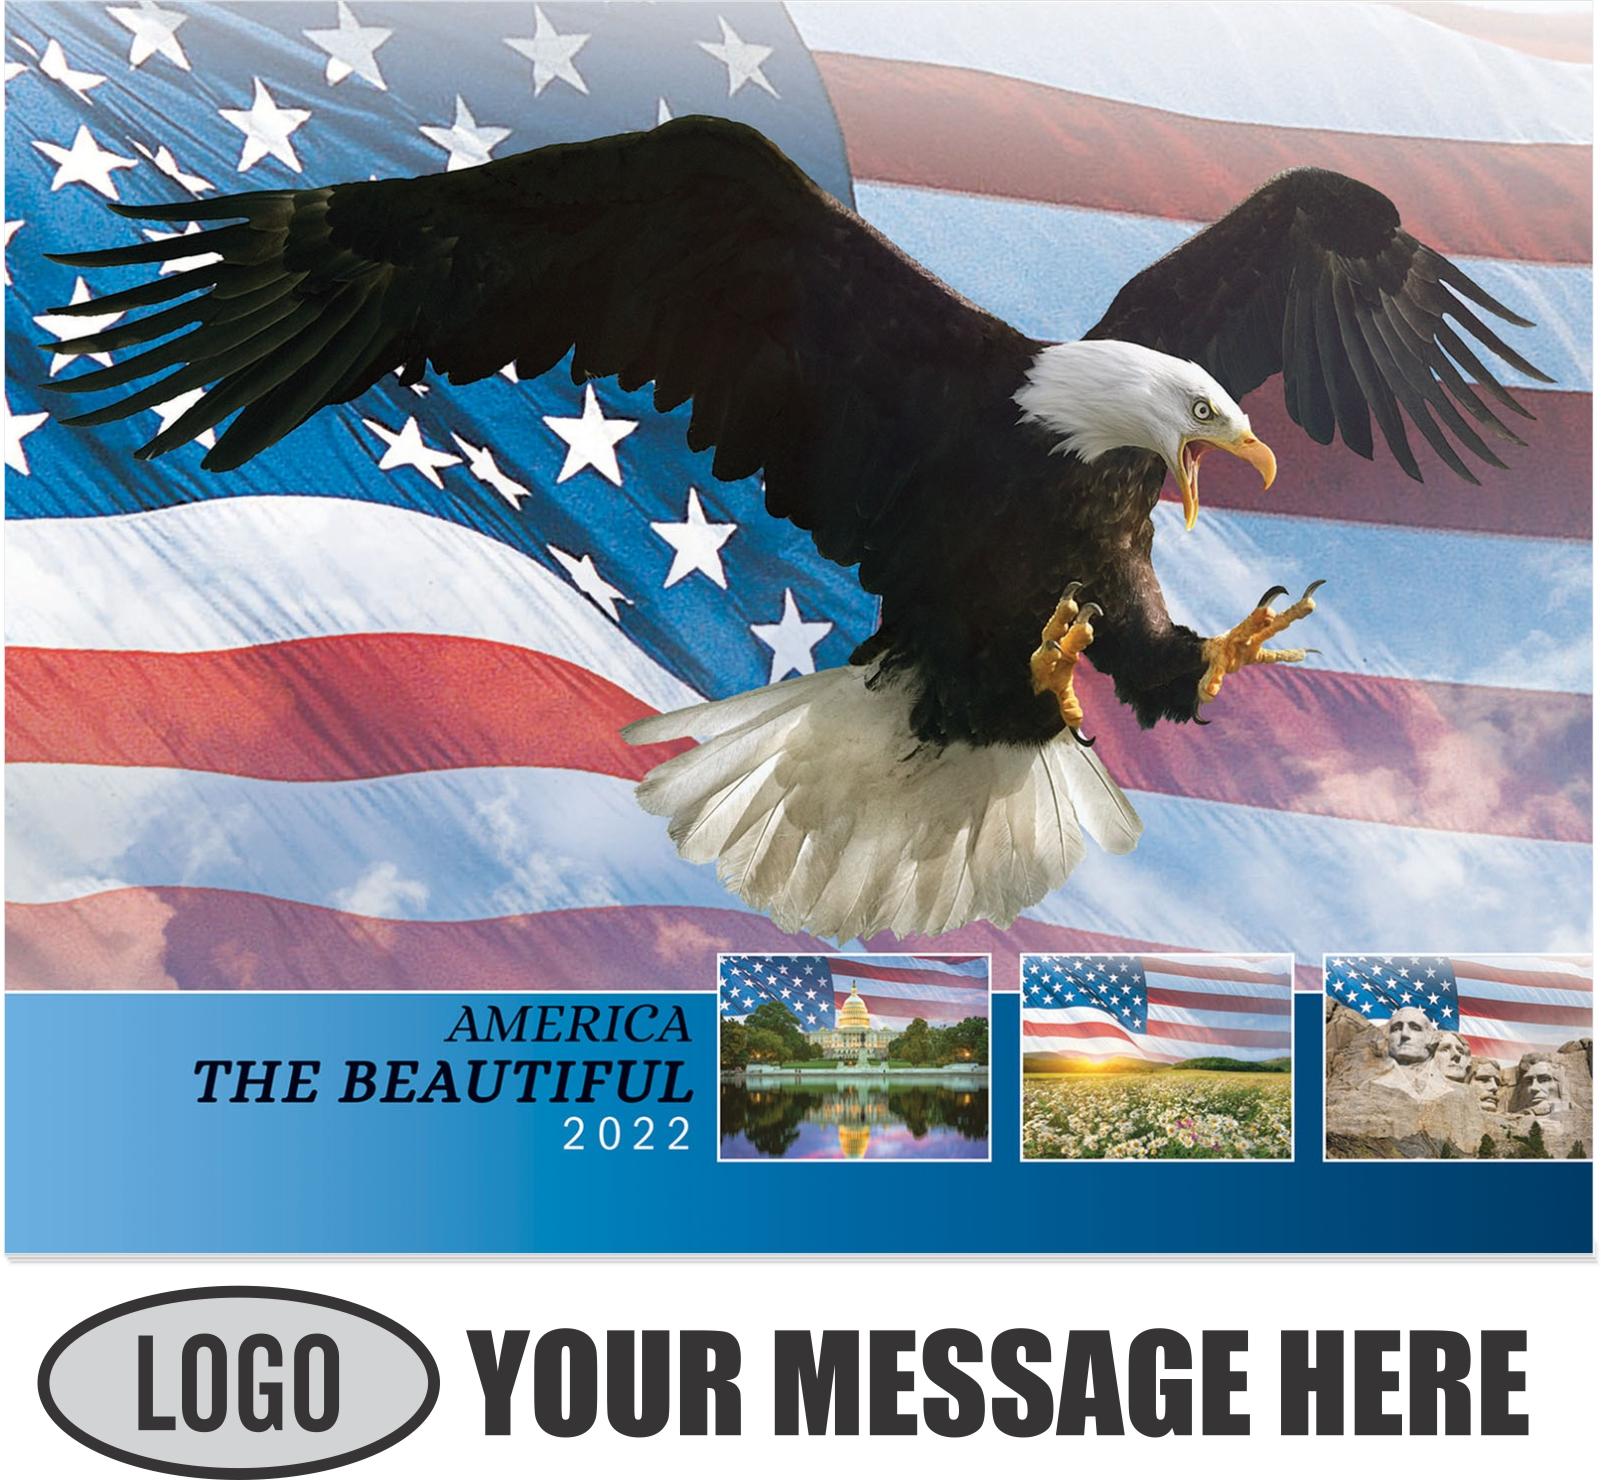 2022 America the Beautiful Promotional Calendar